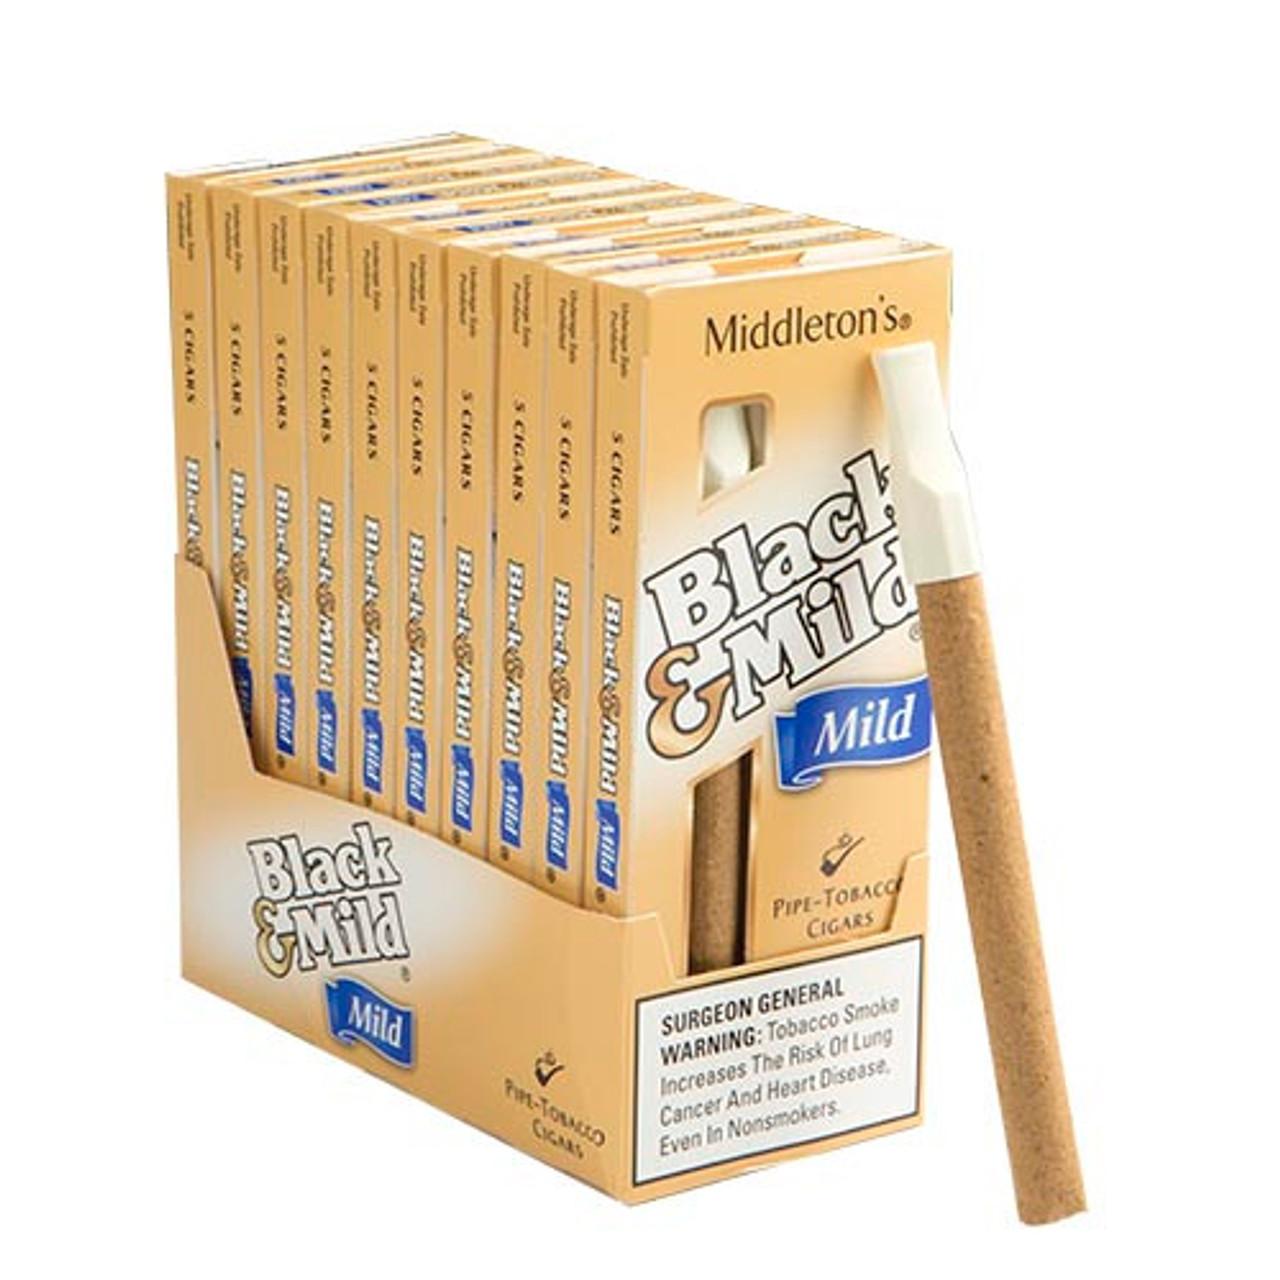 Black and Mild Select Cigars (10 packs of 5) - Natural